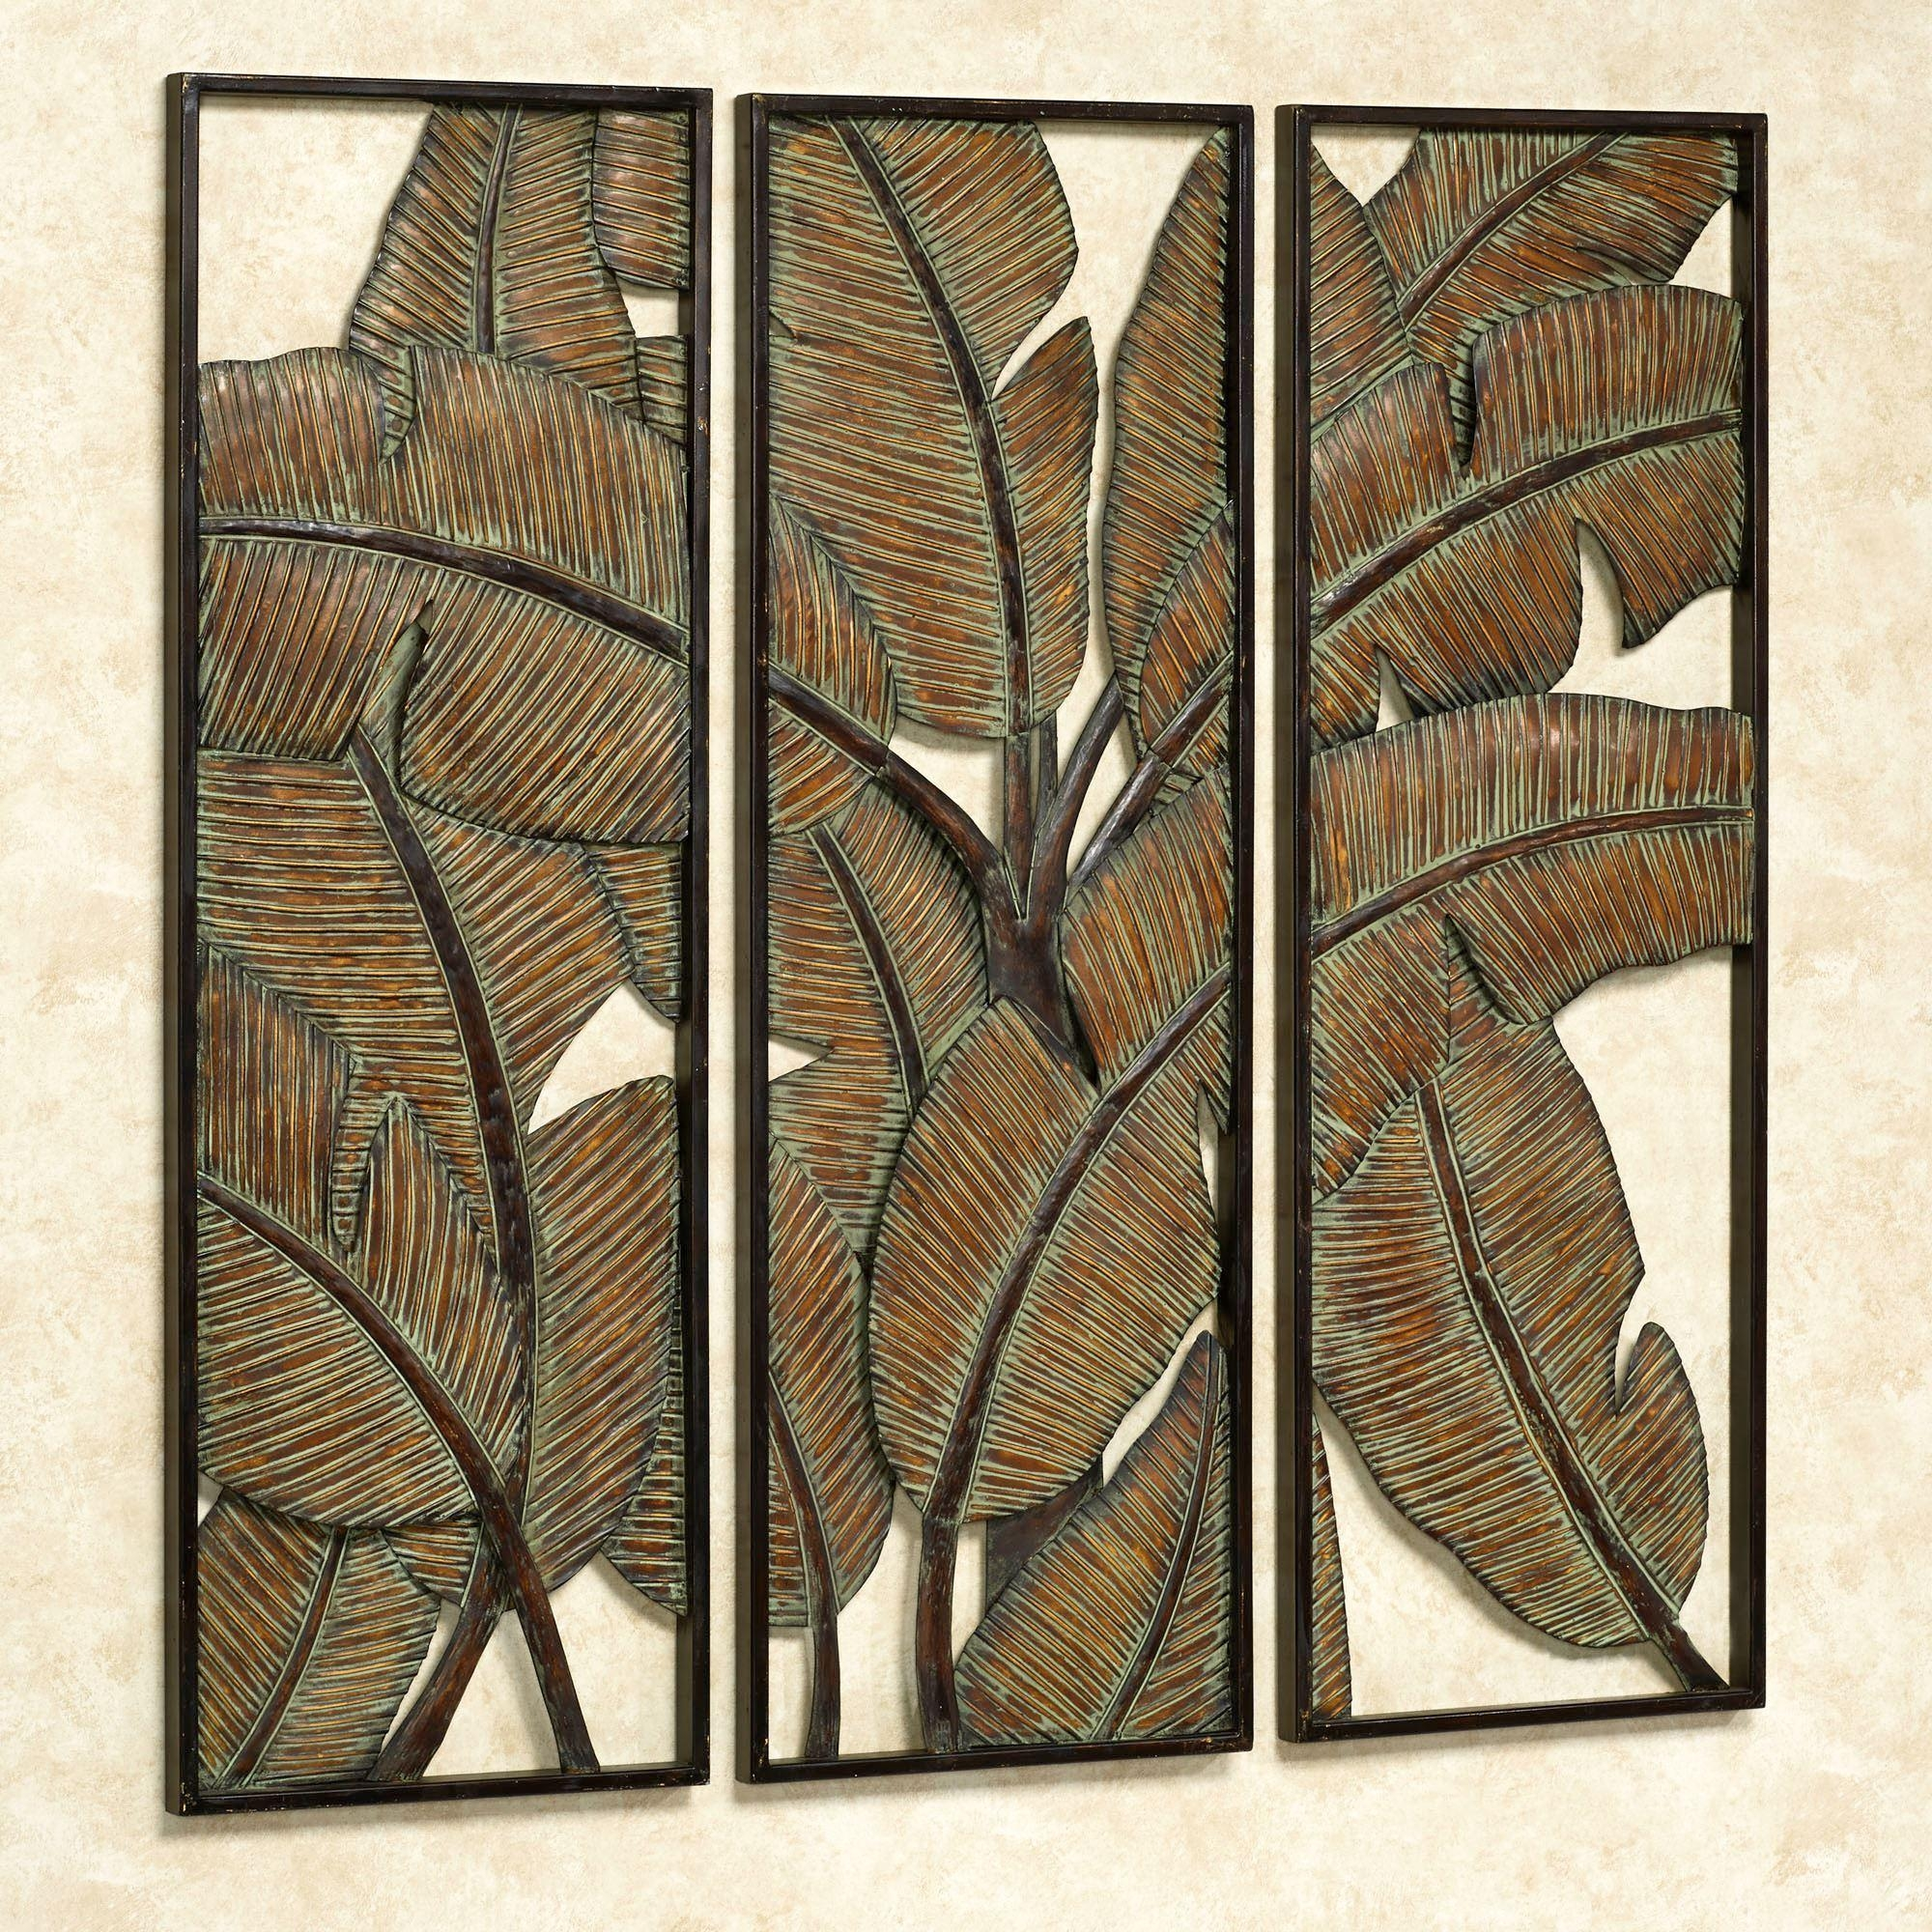 Kaylani Tropical Leaf Metal Wall Art Panel Set Regarding Three Panel Wall Art (Image 11 of 20)